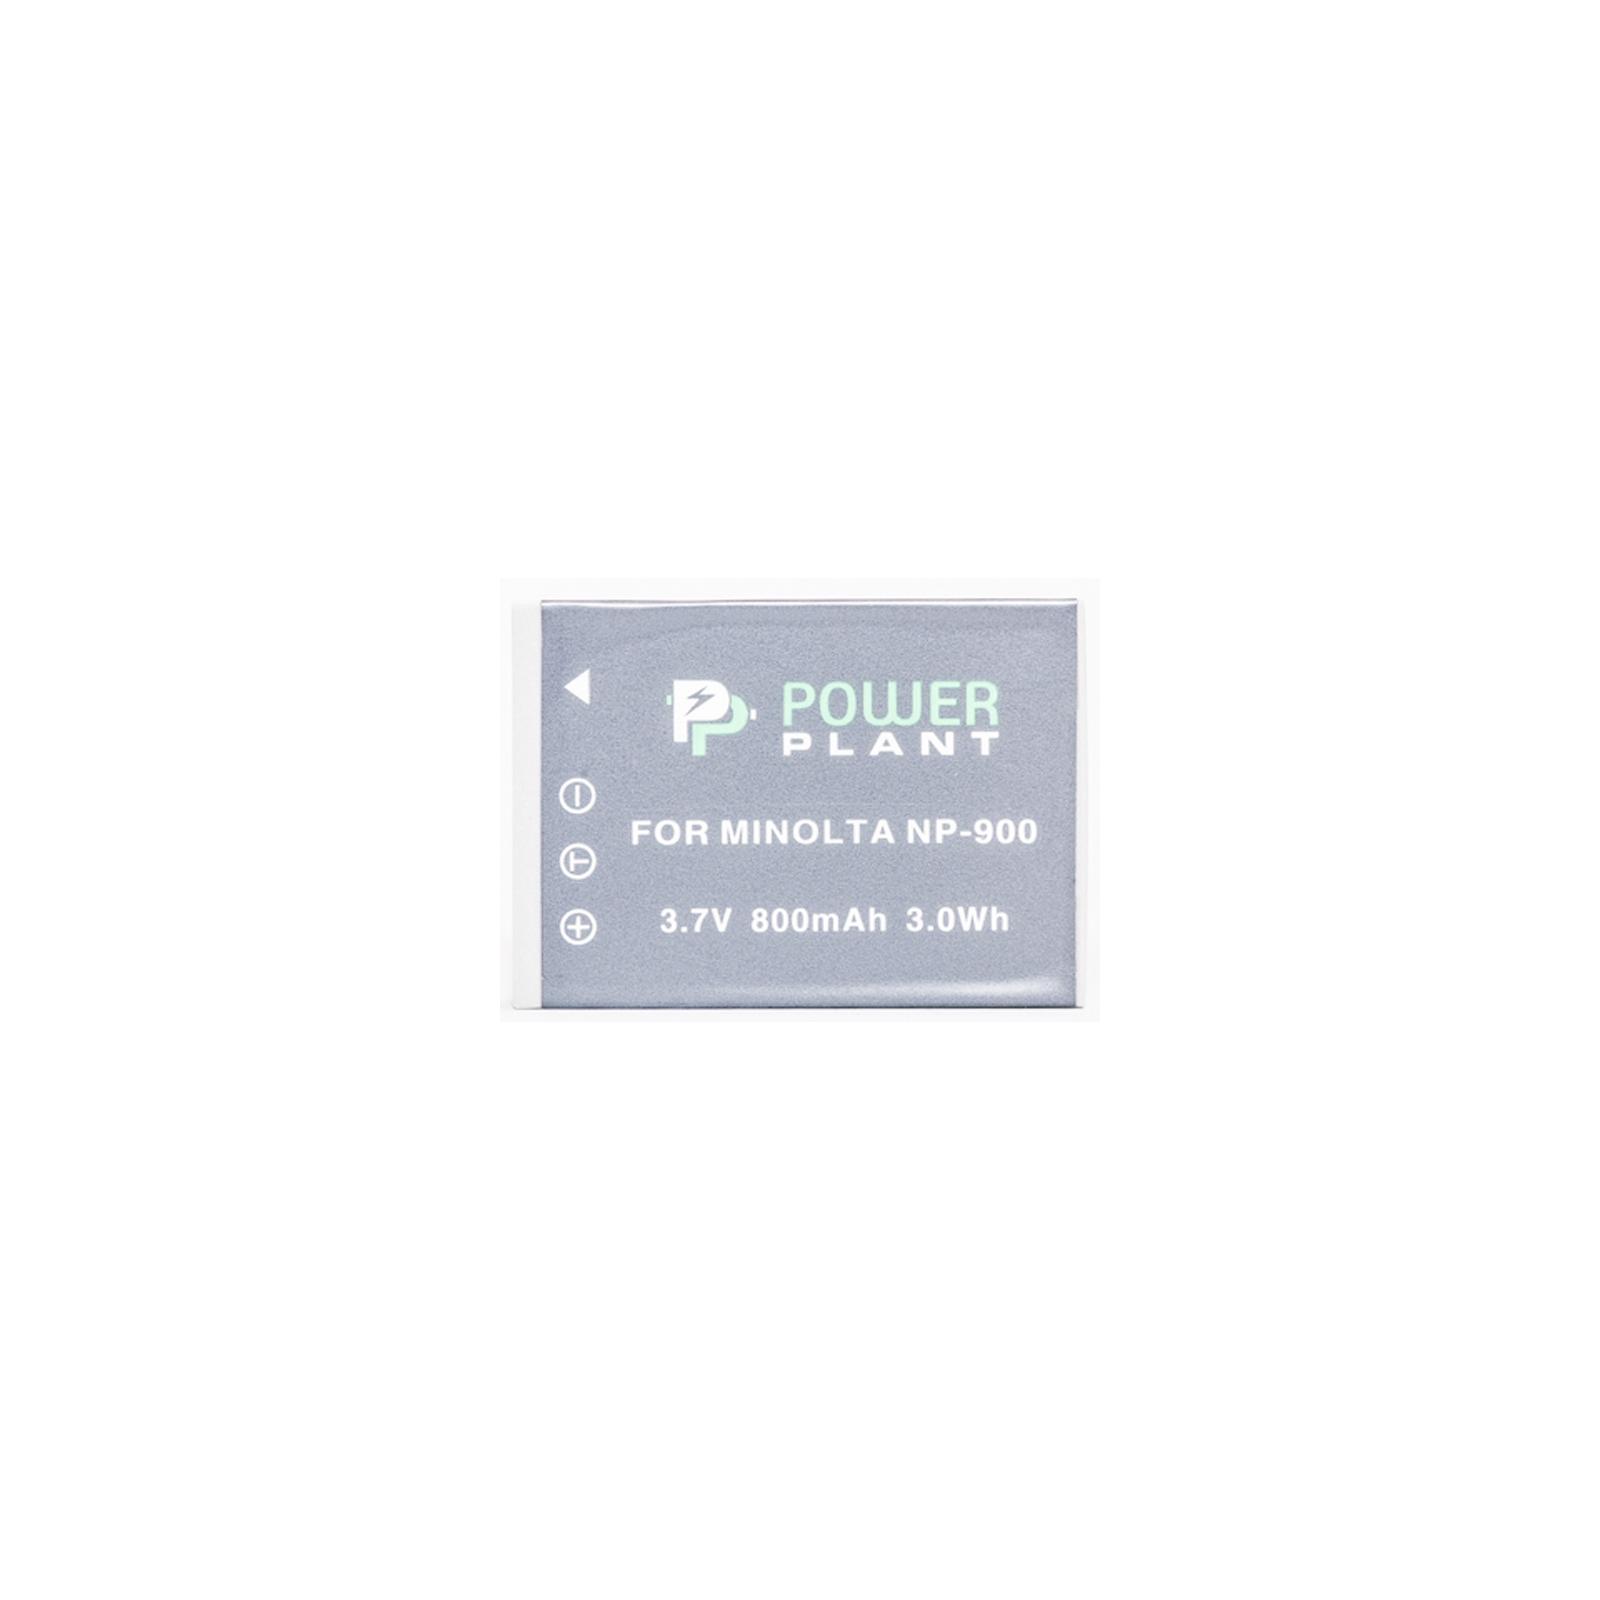 Аккумулятор к фото/видео PowerPlant Minolta NP-900,Li-80B (DV00DV1070) изображение 2